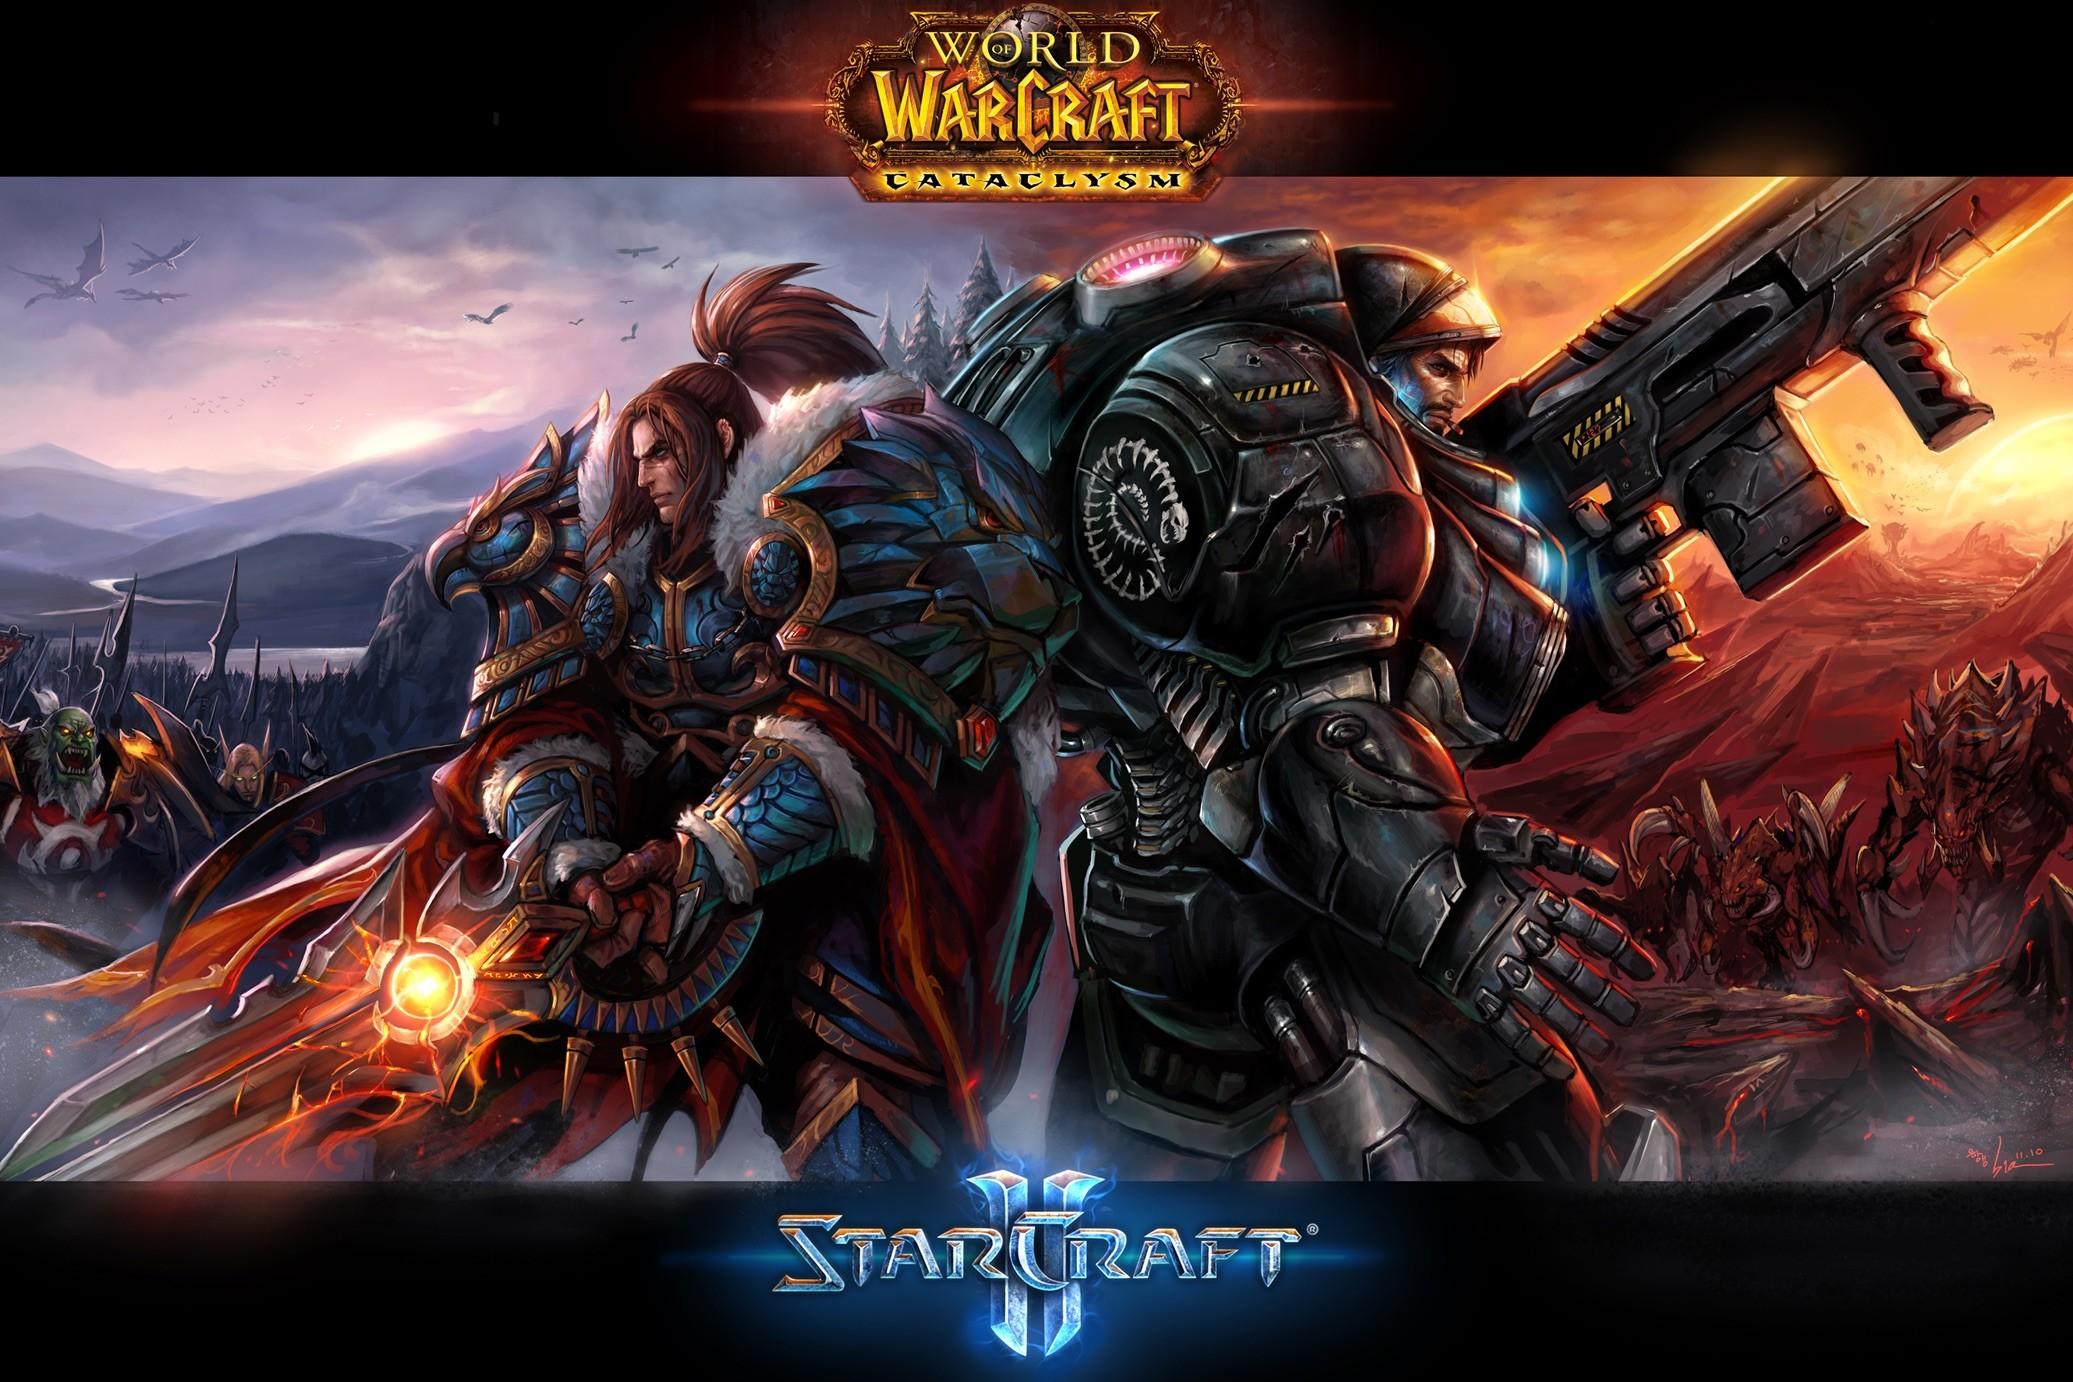 Wallpaper 2073x1382 Px Starcraft Ii World Of Warcraft